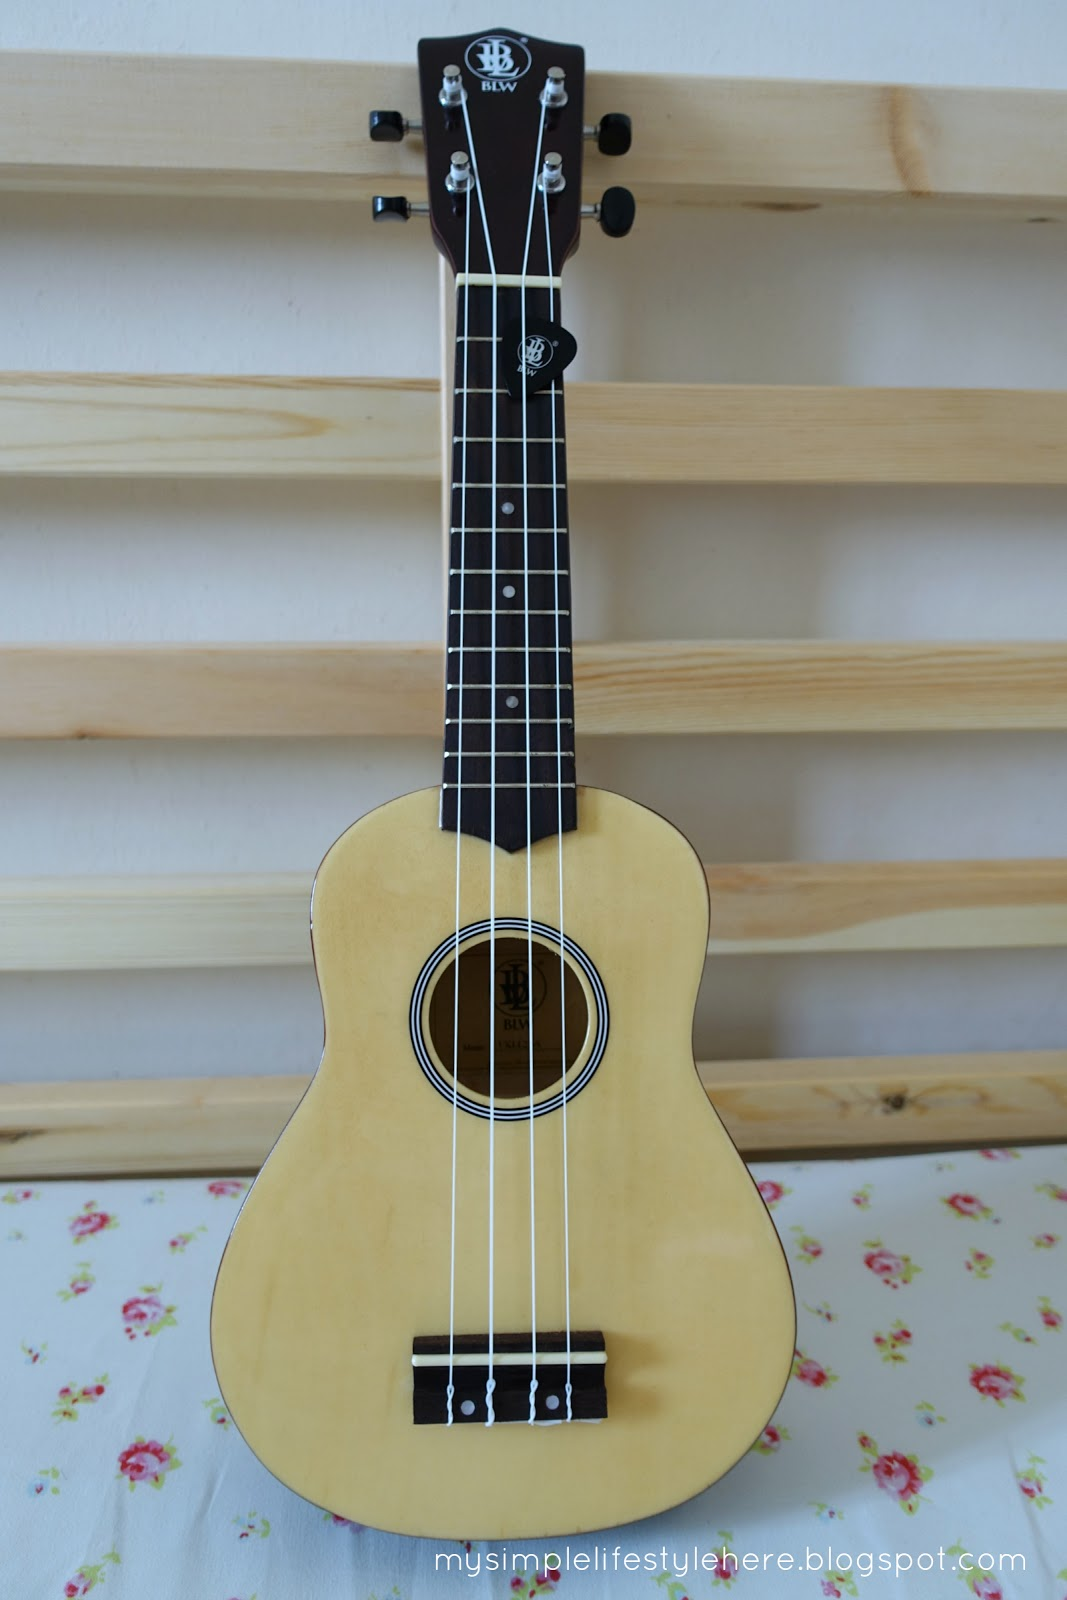 My Simple Lifestyle Uke String Diagram Related Keywords Suggestions Musical Instruments Ukulele Blw 21 Inch 4 Nylon Strings Soprano Ukelele Hawaii Guitar Free Bag Chord Chart Picks